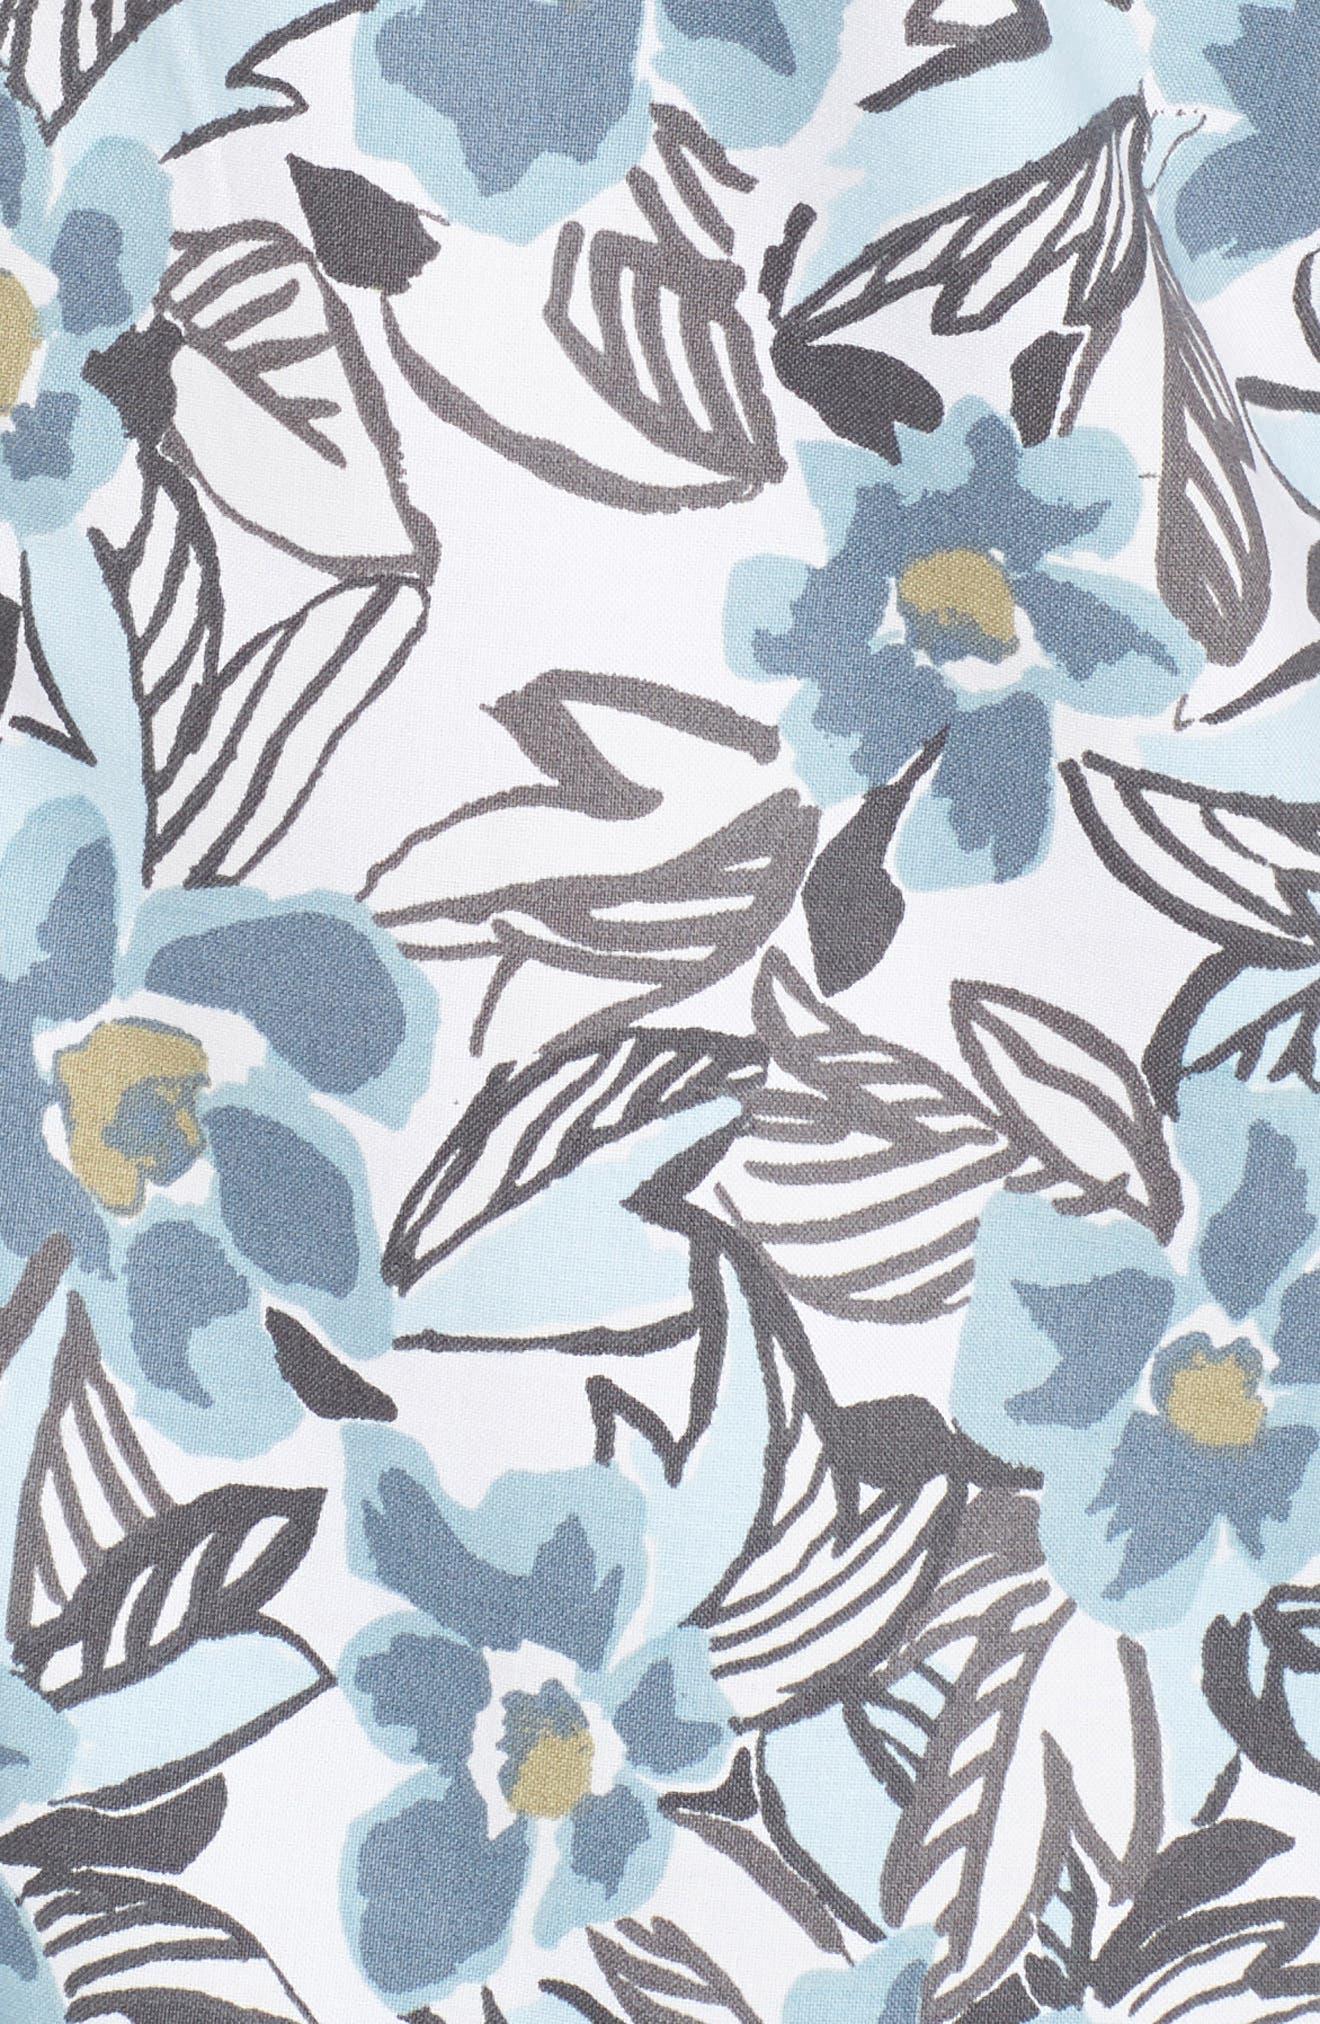 Paradise Valley Floral Woven Shirt,                             Alternate thumbnail 5, color,                             142